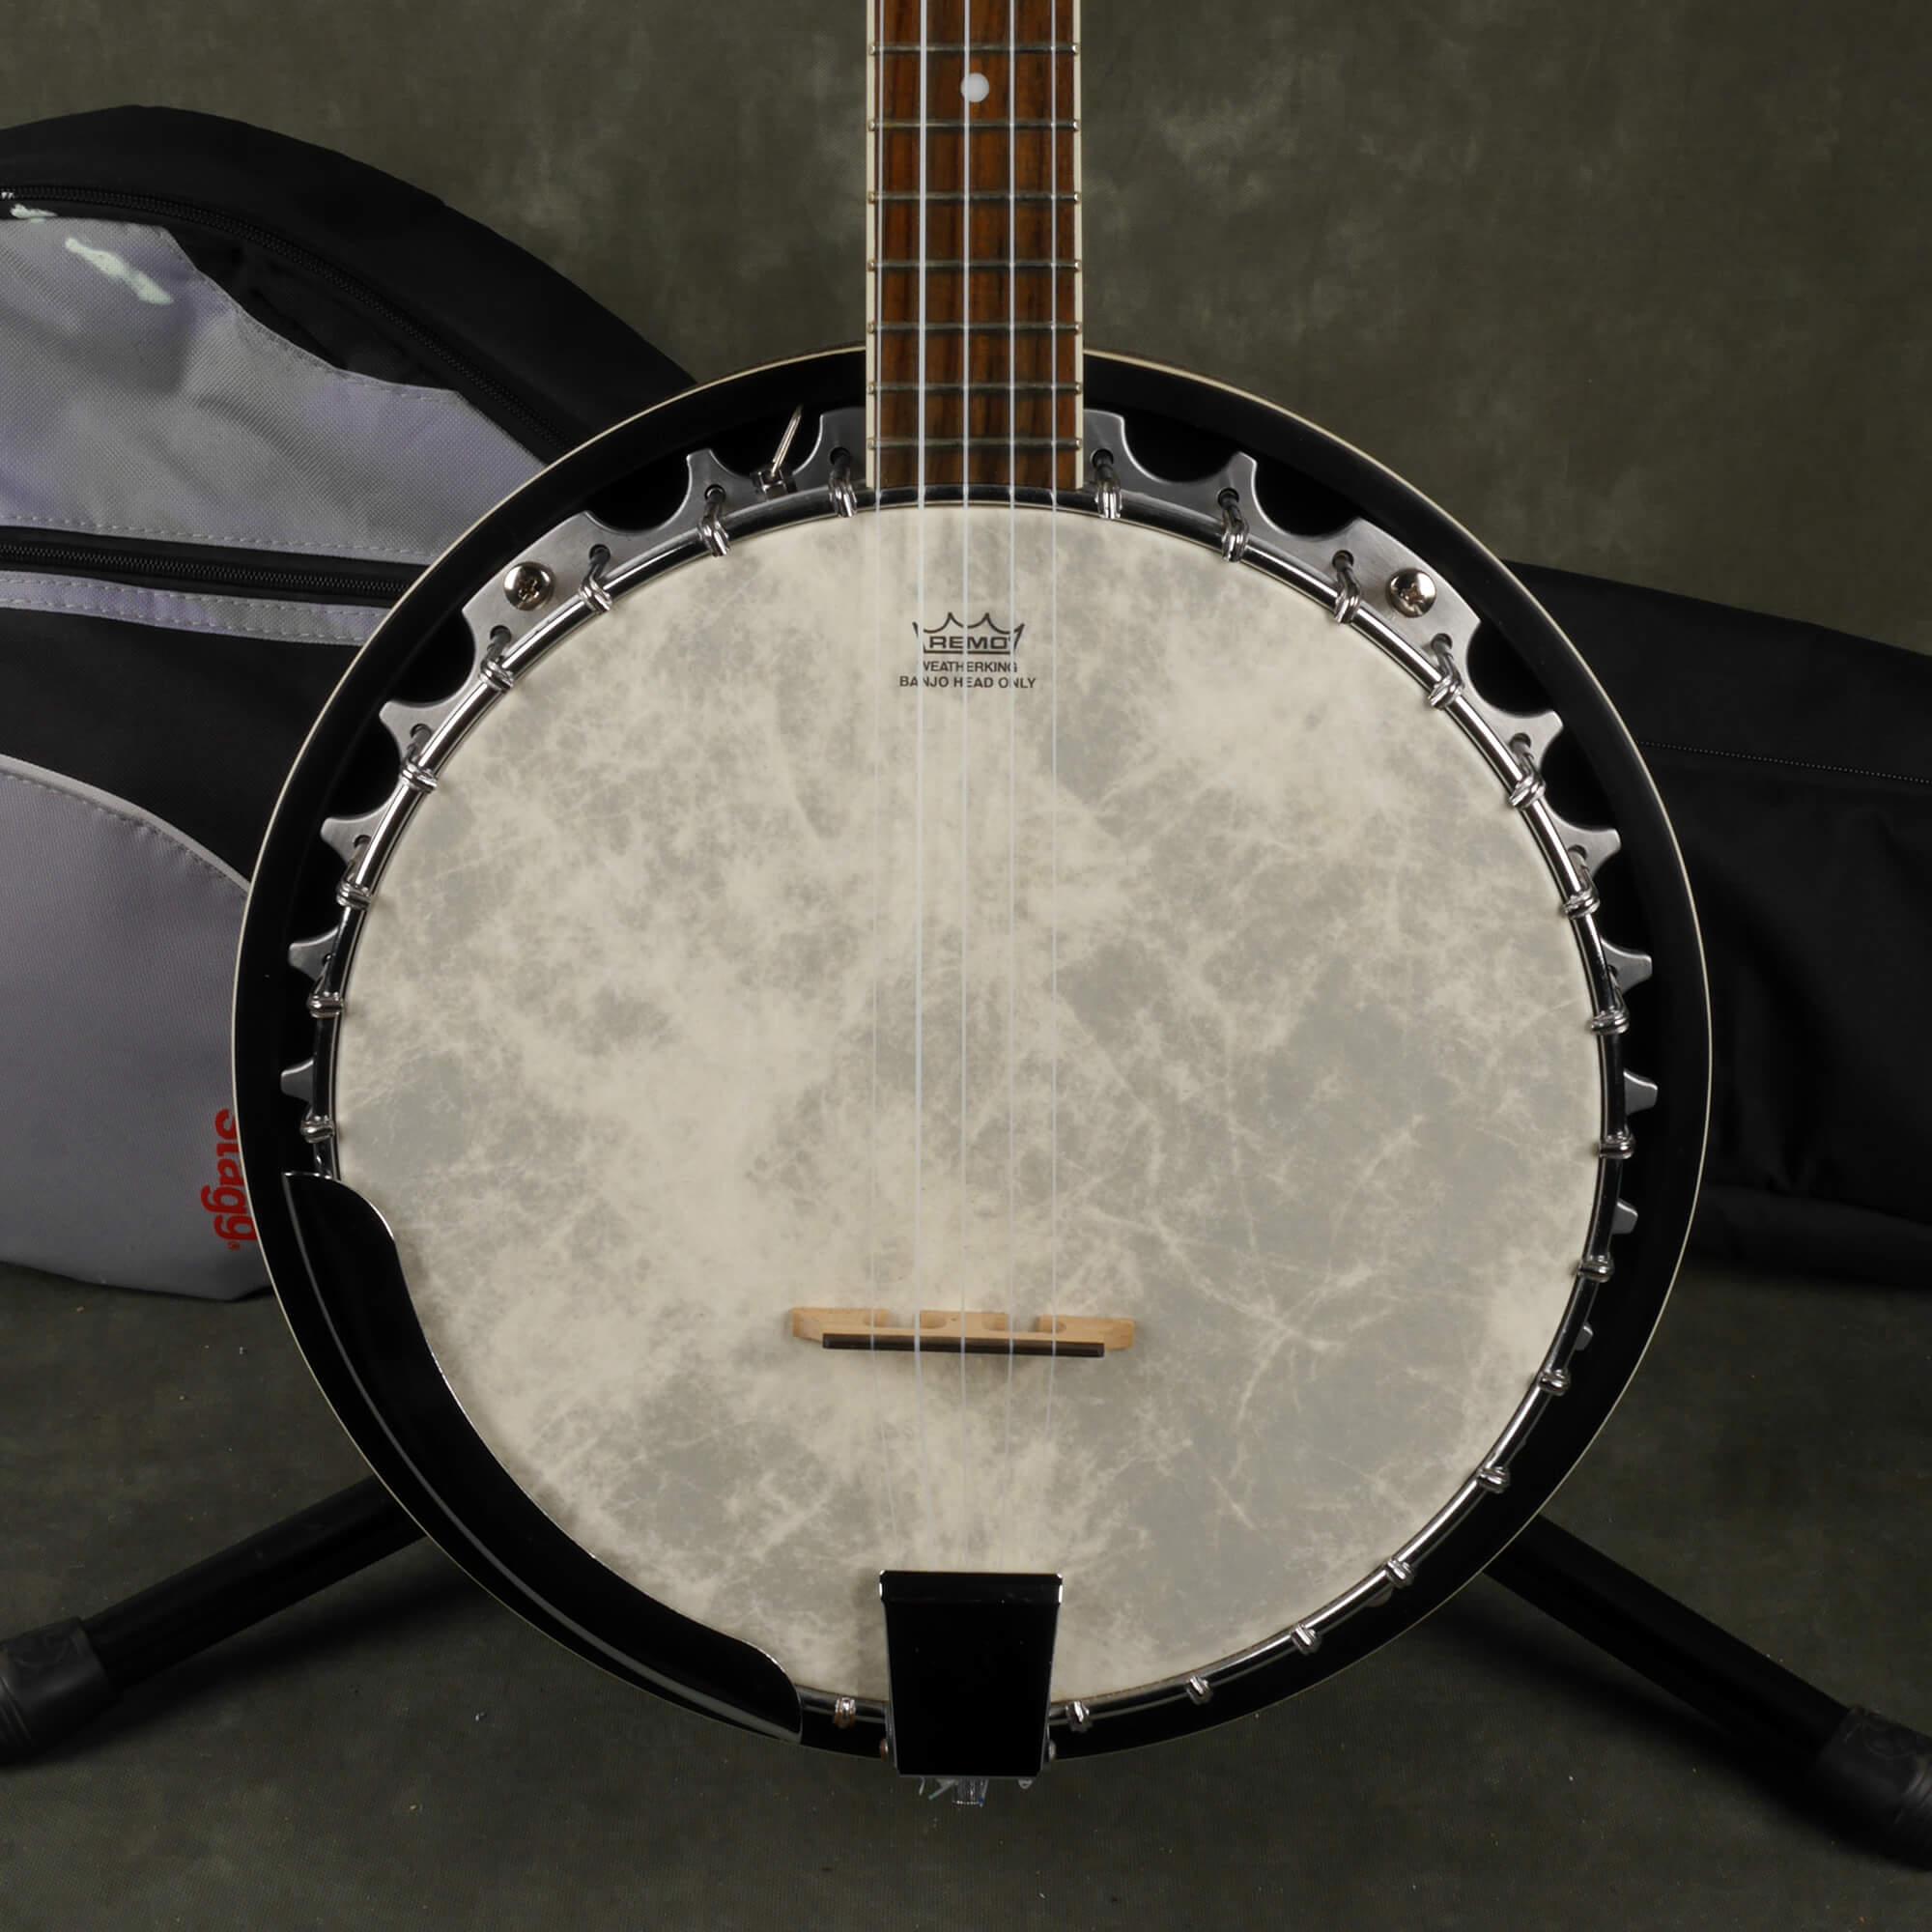 Barnes & Mullins BJ304 Tenor Banjo w/Gig Bag - 2nd Hand ...